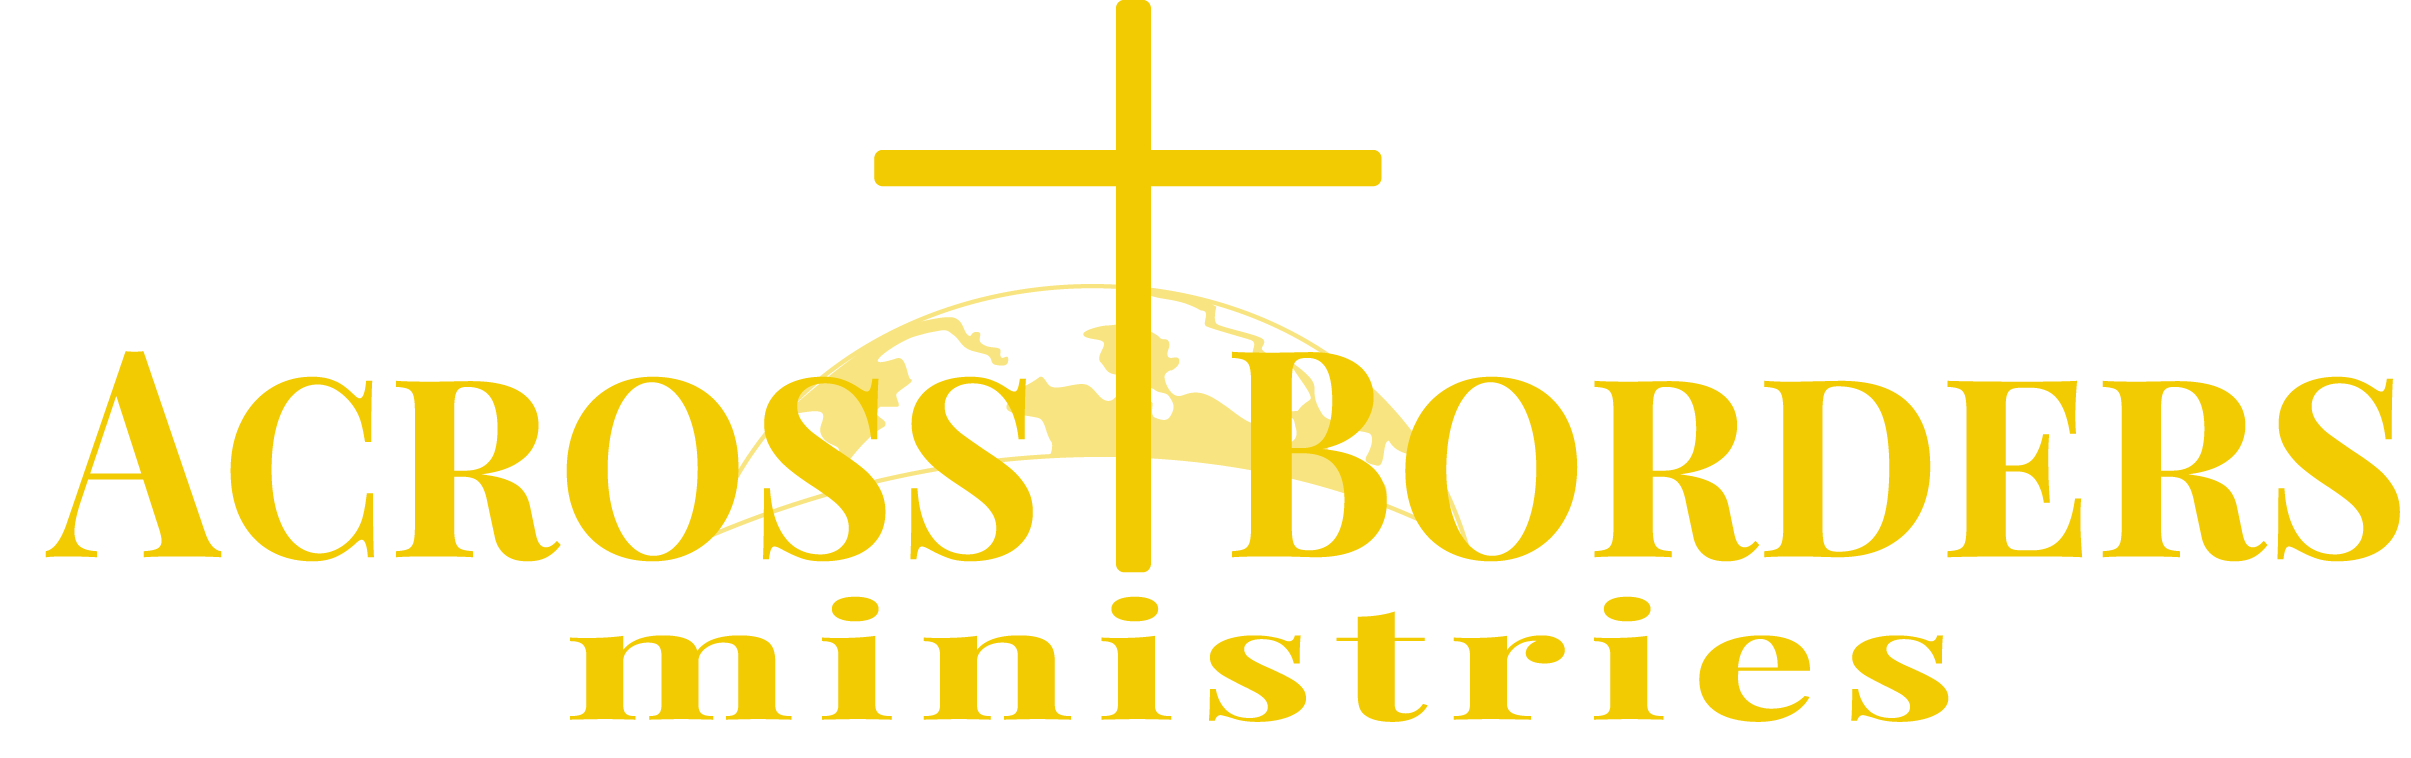 Across Borders Ministries